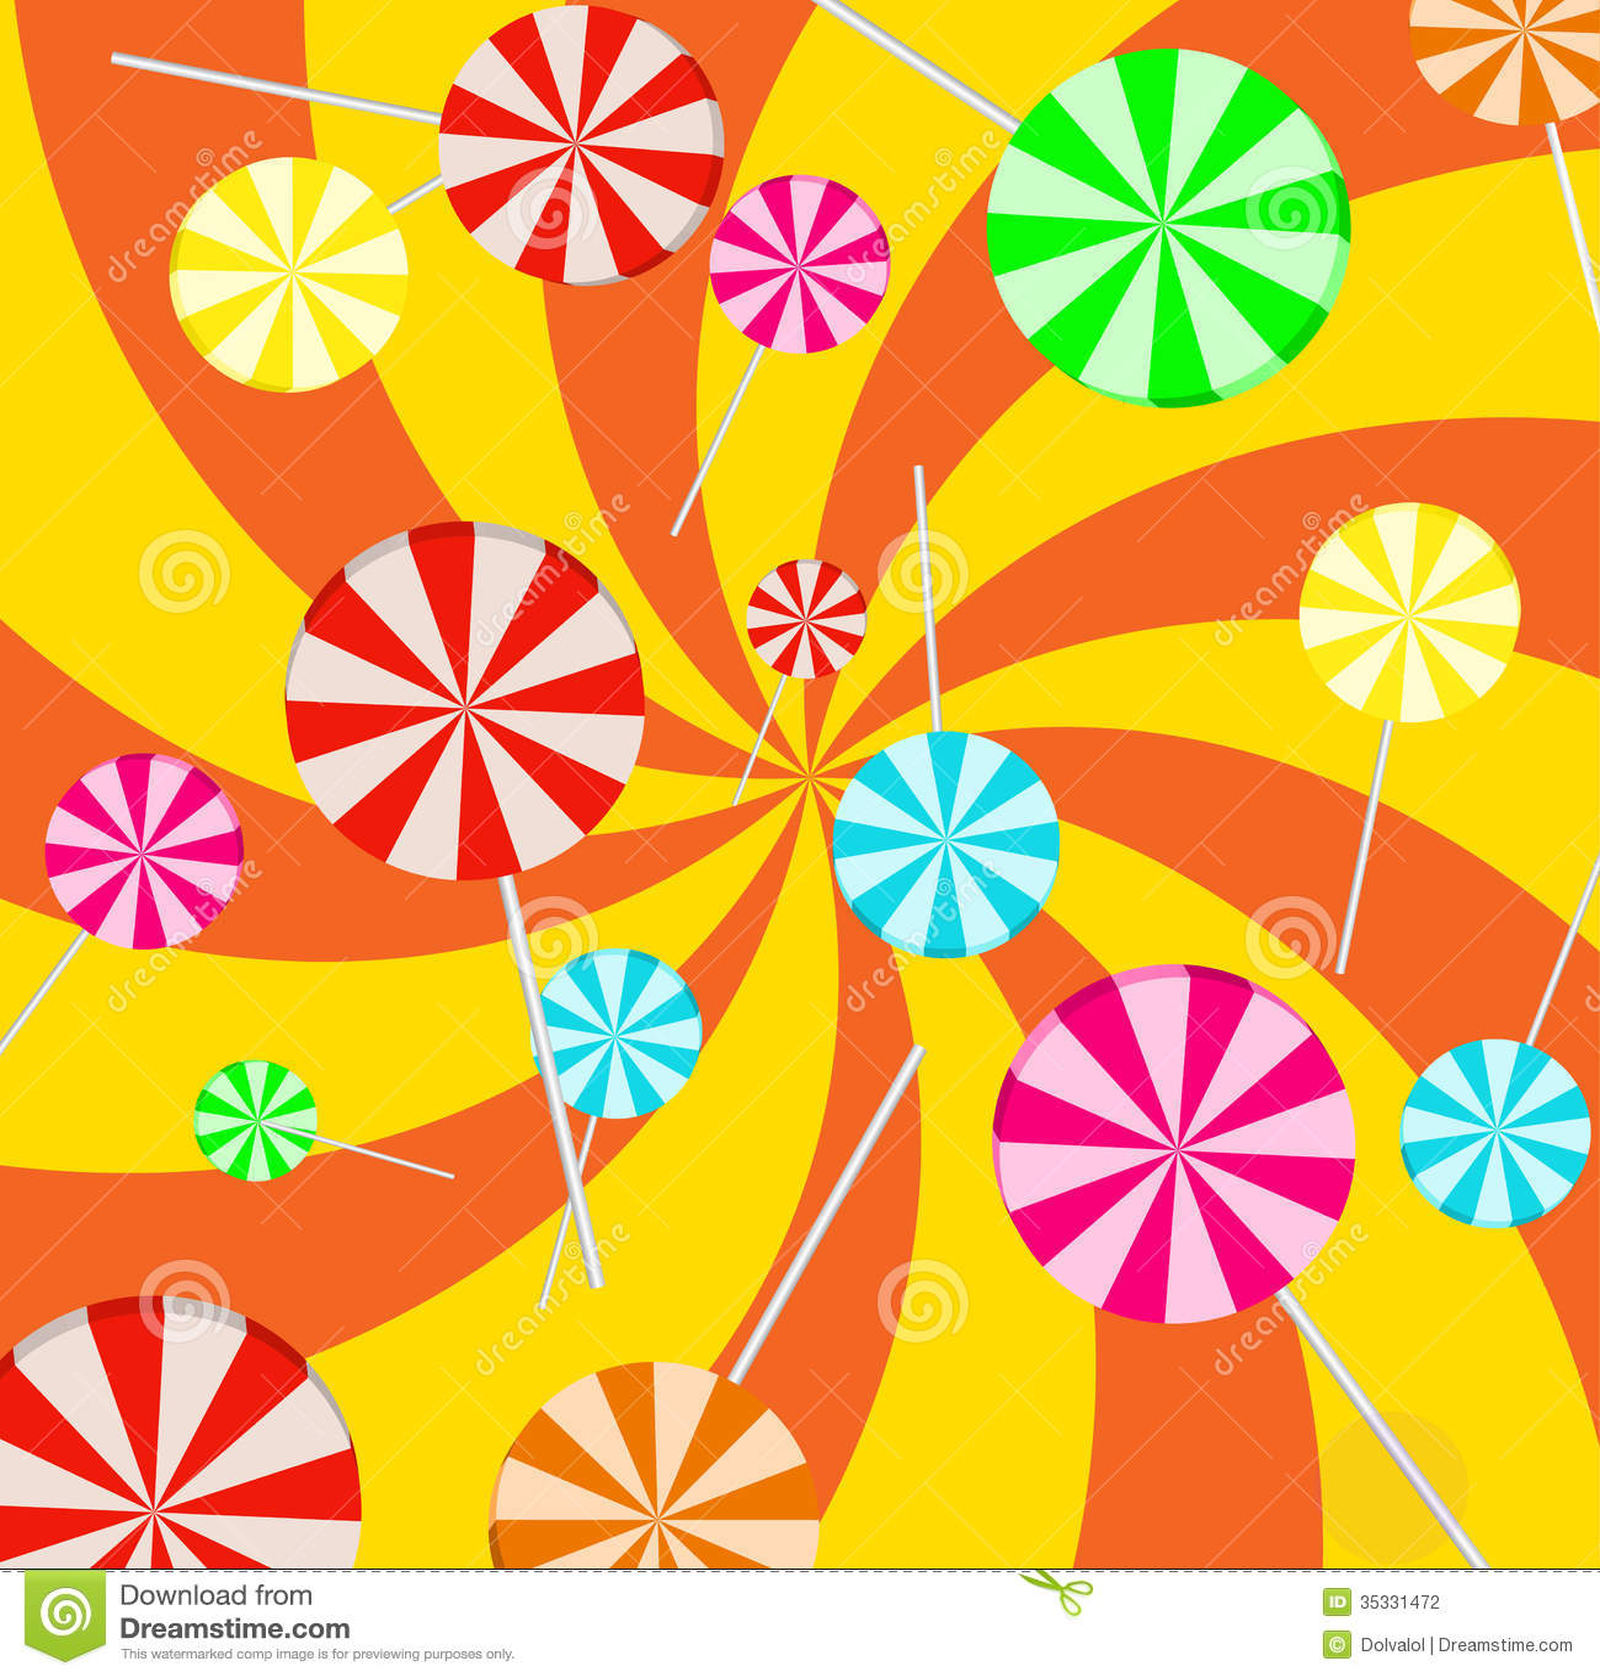 Cute Lollipop Wallpaper Background Lollipop Stock Vector Illustration Of Green